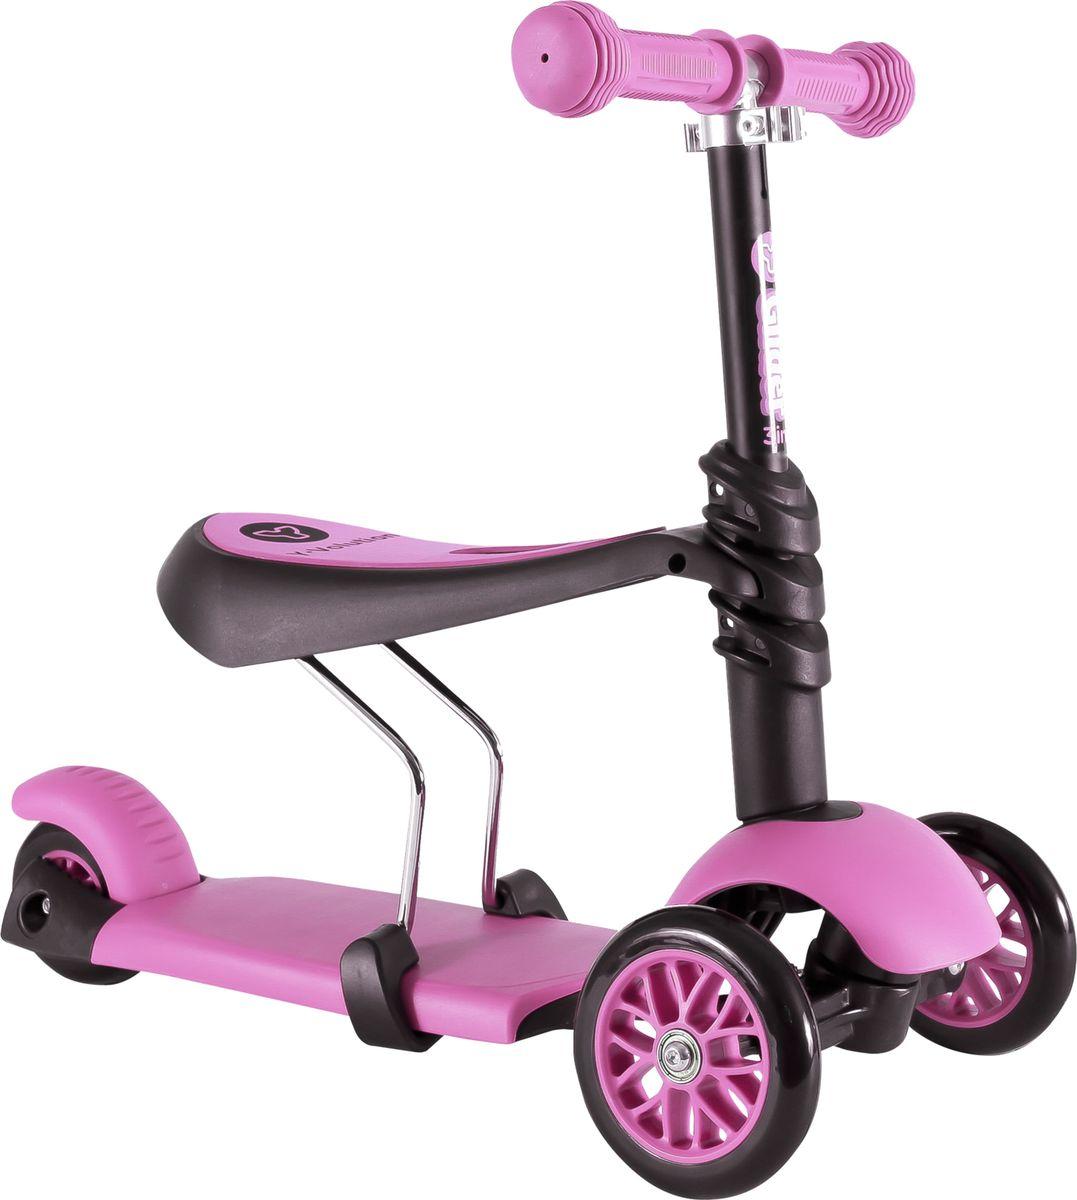 YVolution Самокат-беговел Glider 3 в 1 цвет розовый -  Беговелы